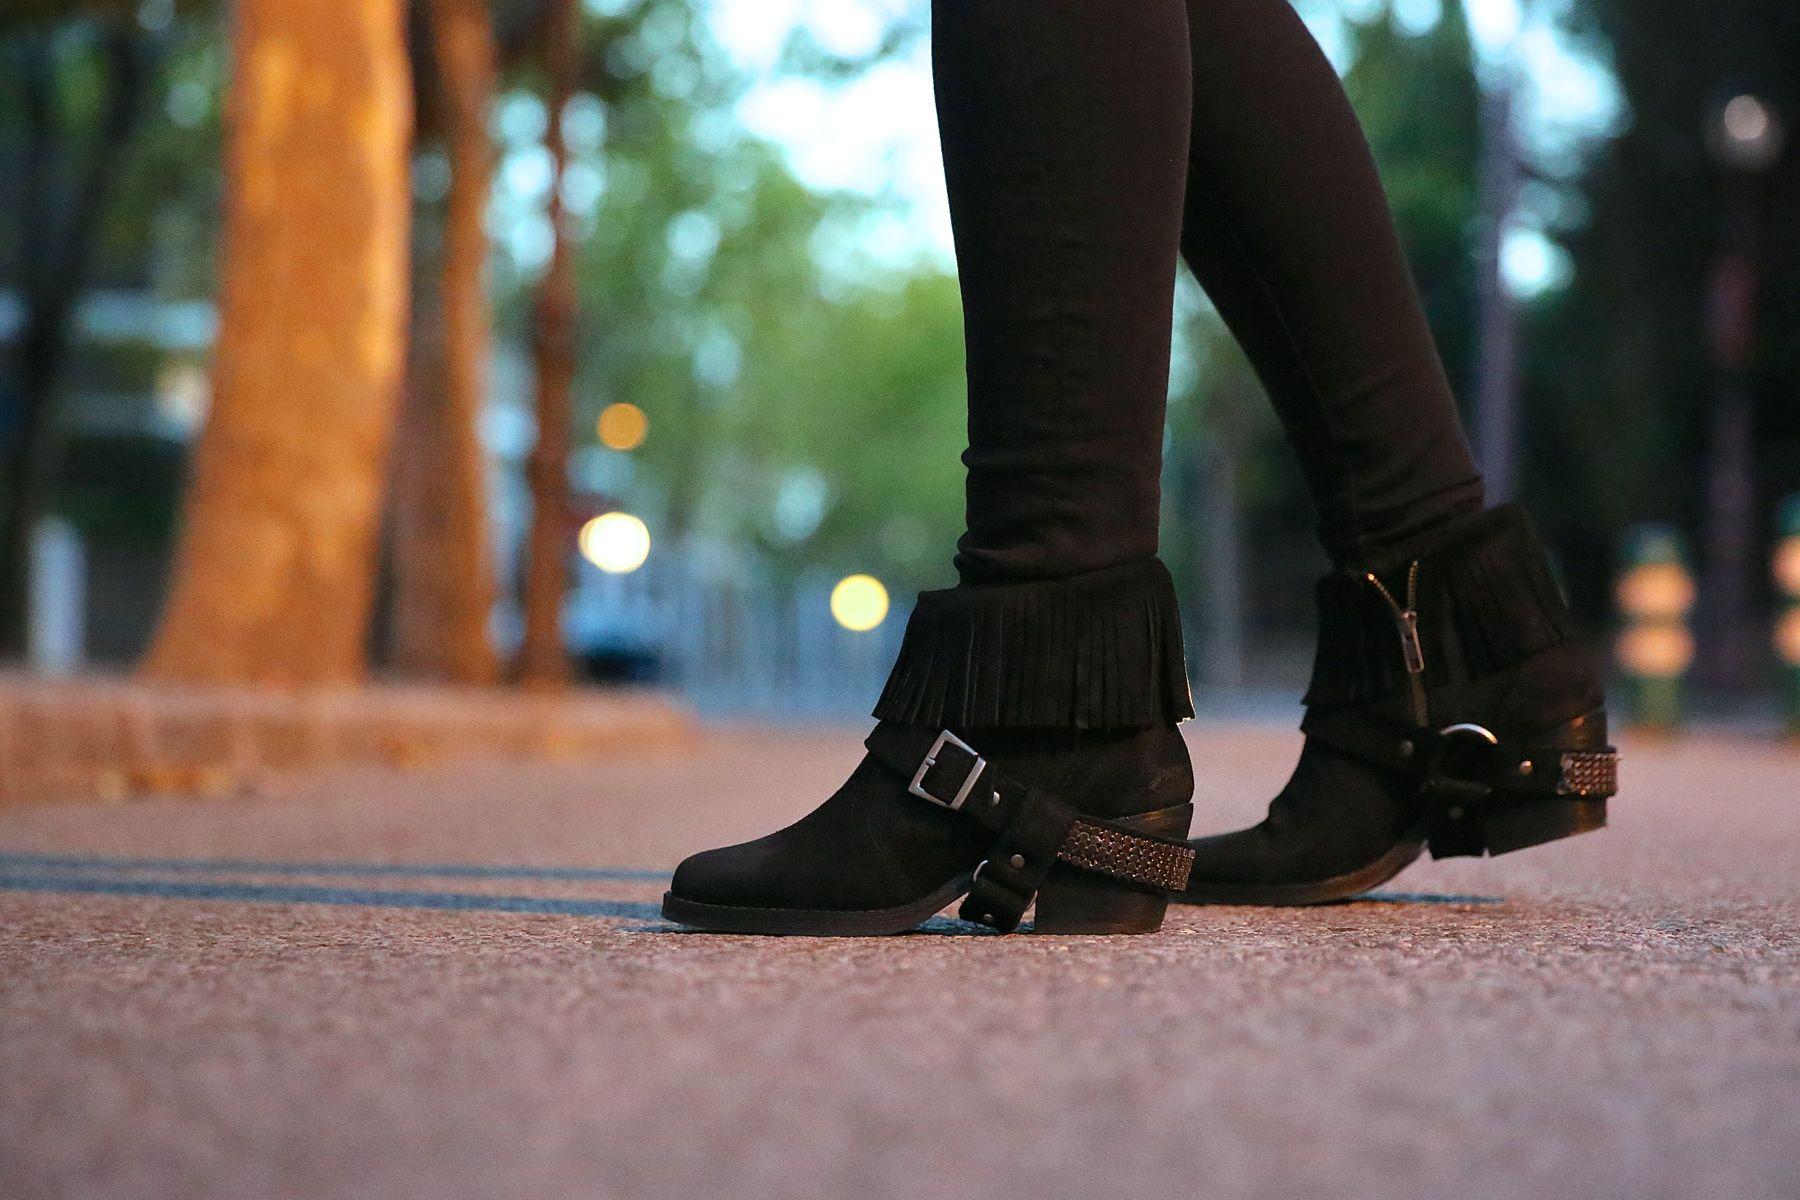 trendy_taste-look-outfit-street_style-ootd-blog-blogger-fashion_spain-moda_españa-abrigo_borrego-borreguillo-otoño-frio-cold-hat-sombrero-boho-hippie-steve_madden-skinny_jeans-pitillos-fall-2